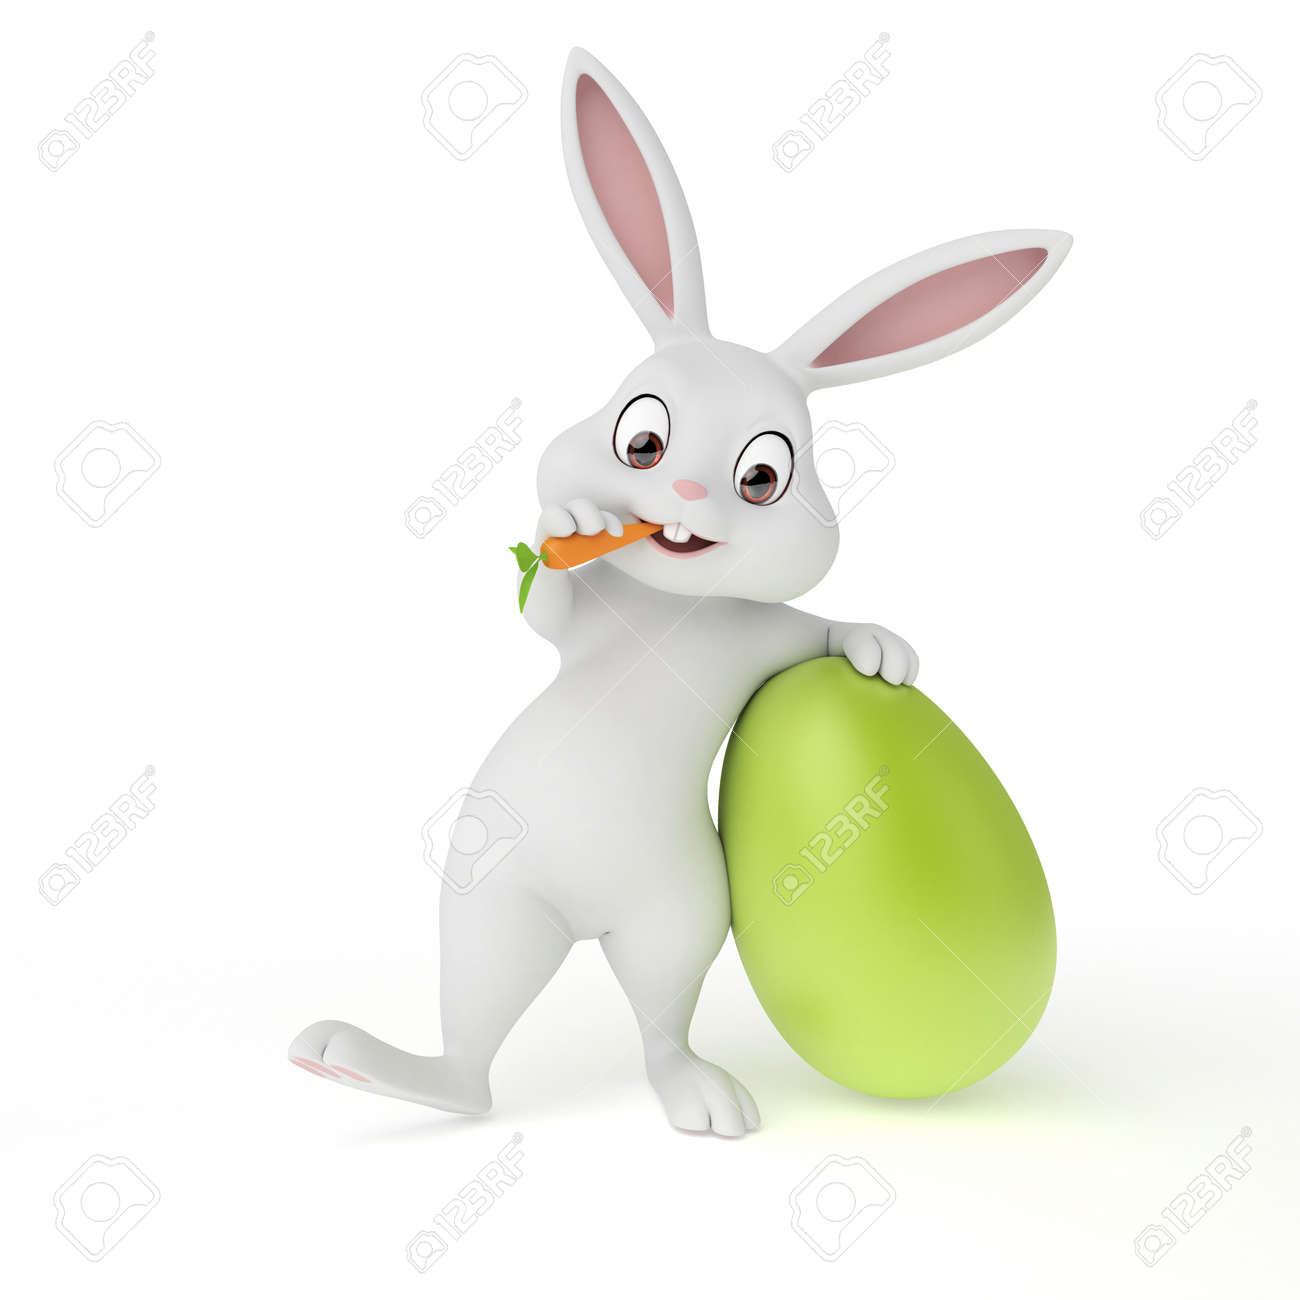 rabbit 3d images u0026 stock pictures royalty free rabbit 3d photos